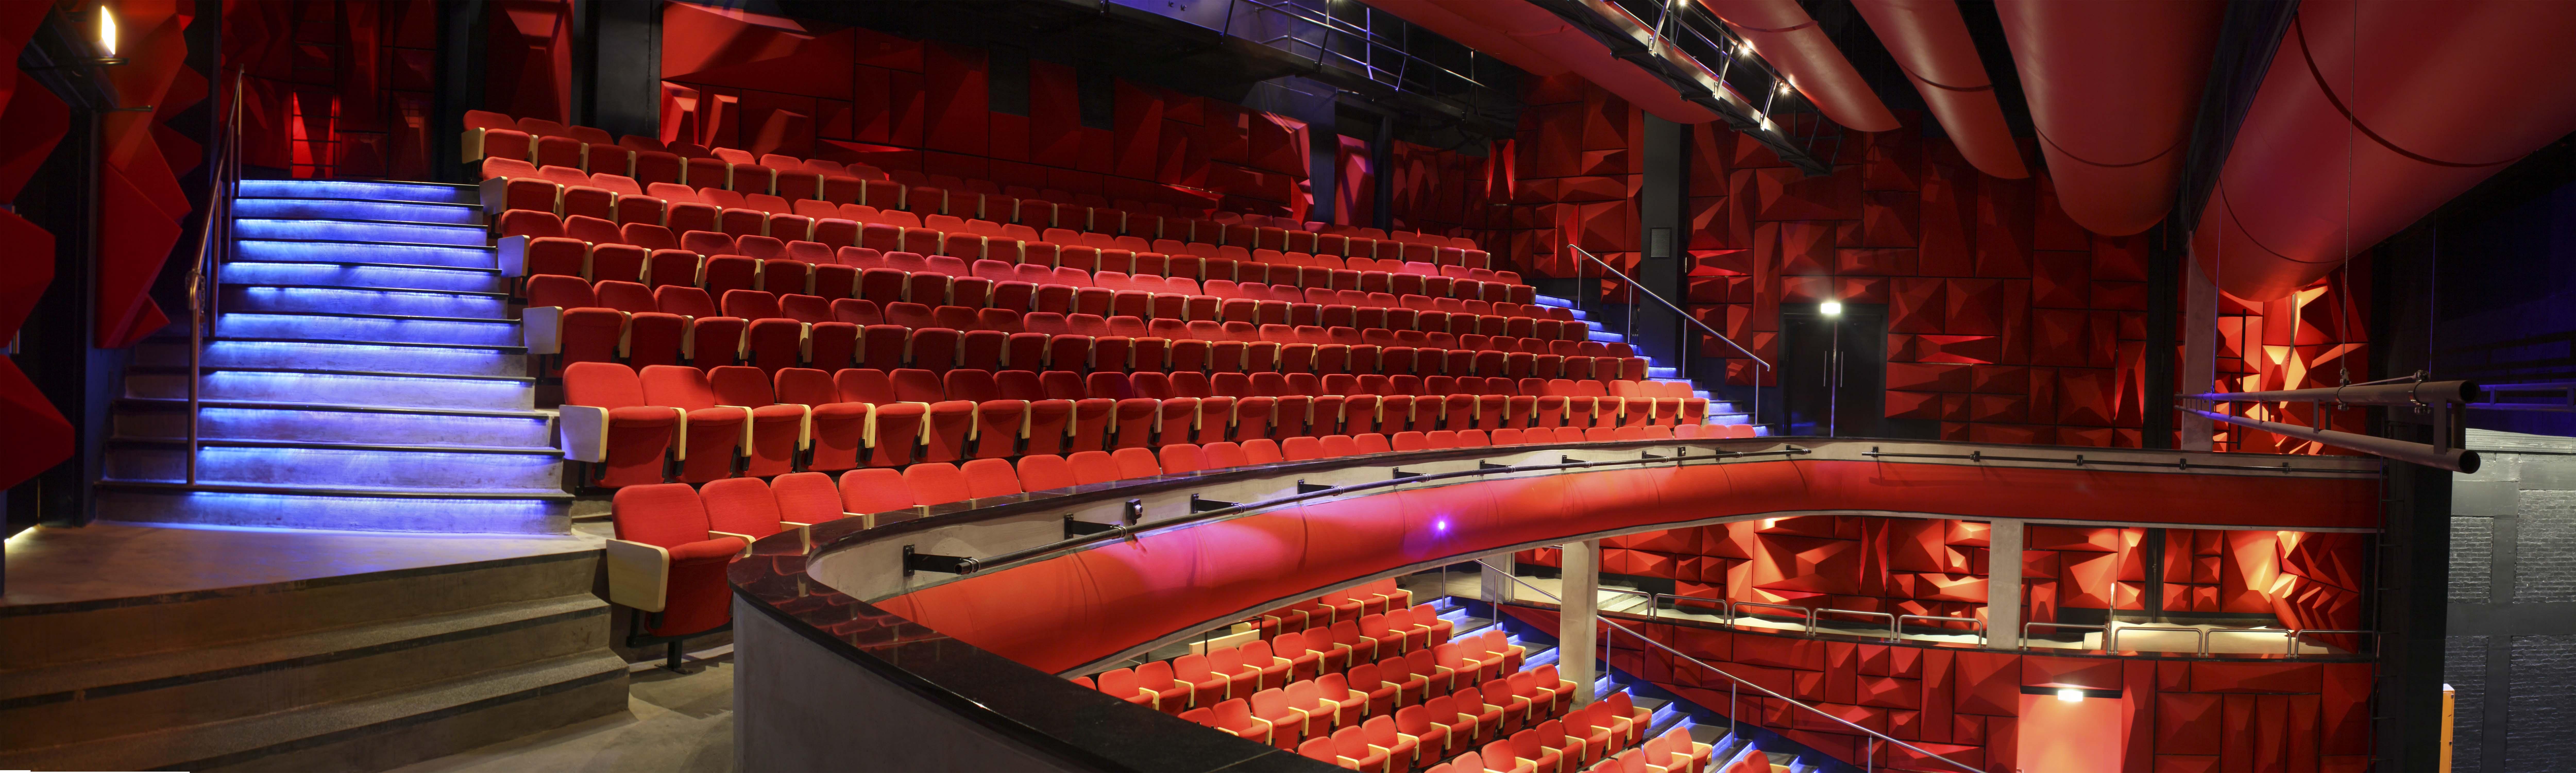 Soweto Theatre ©Tony de Oliveira